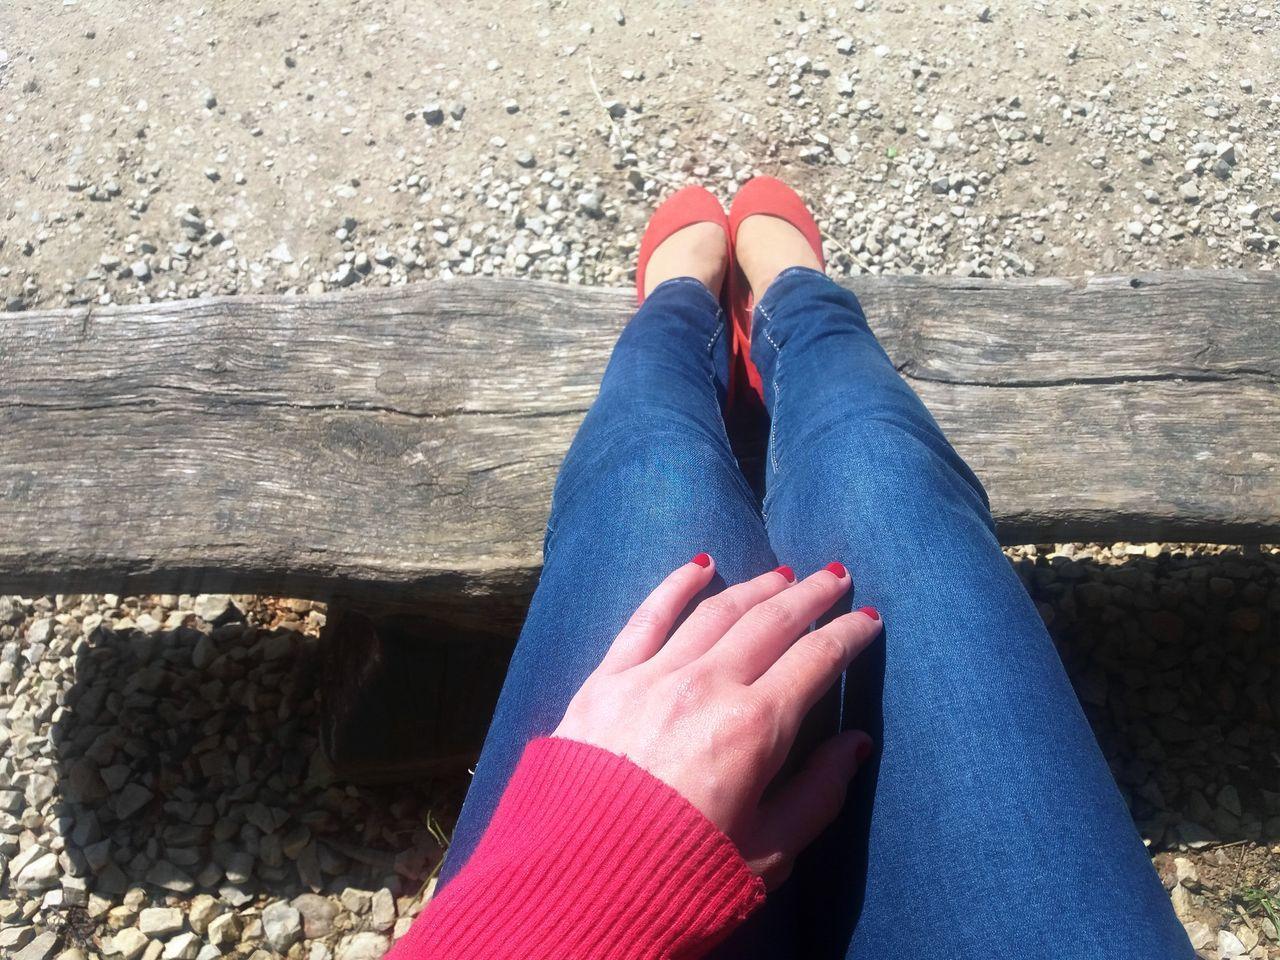 Jeans Red Ballerina Shoes Blue Human Body Part Human Leg One Person Outdoors Sunlight Women